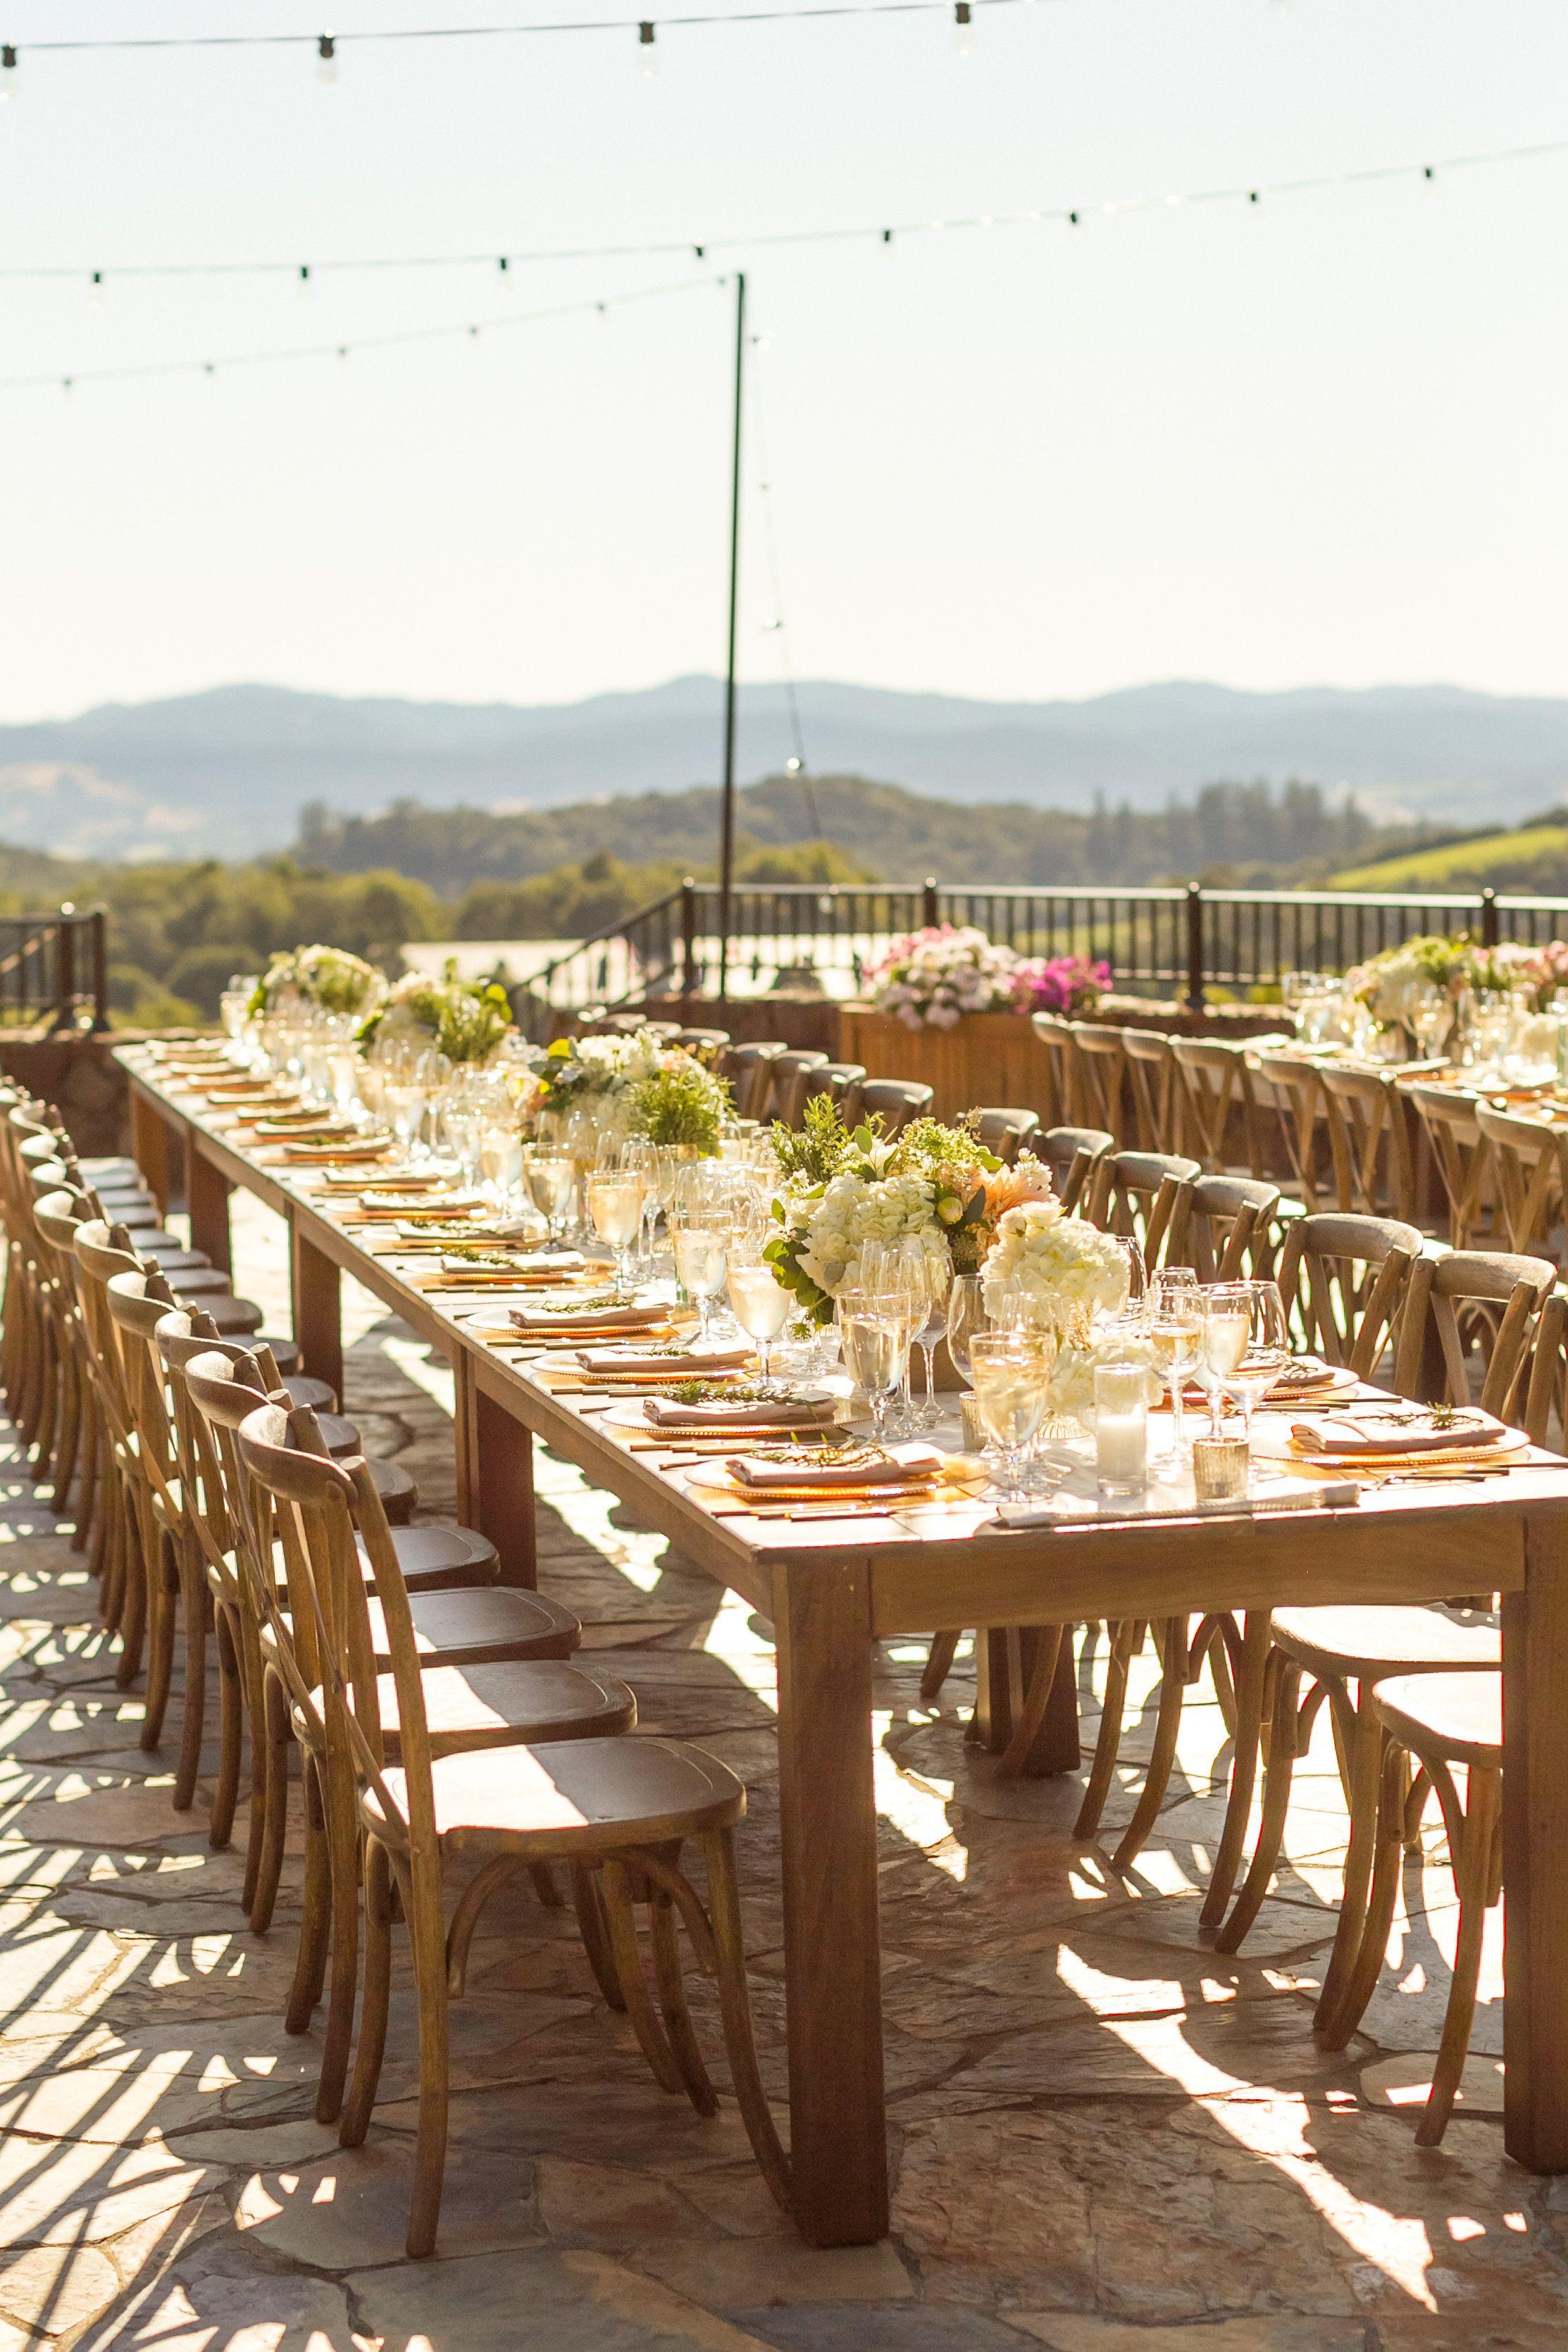 Chalk Hill Estate Winery Sonoma Valley Wedding Reception White Blush Green Centerpieces On Rustic Rustic Elegant Wedding Sonoma Wedding Wine Country Wedding